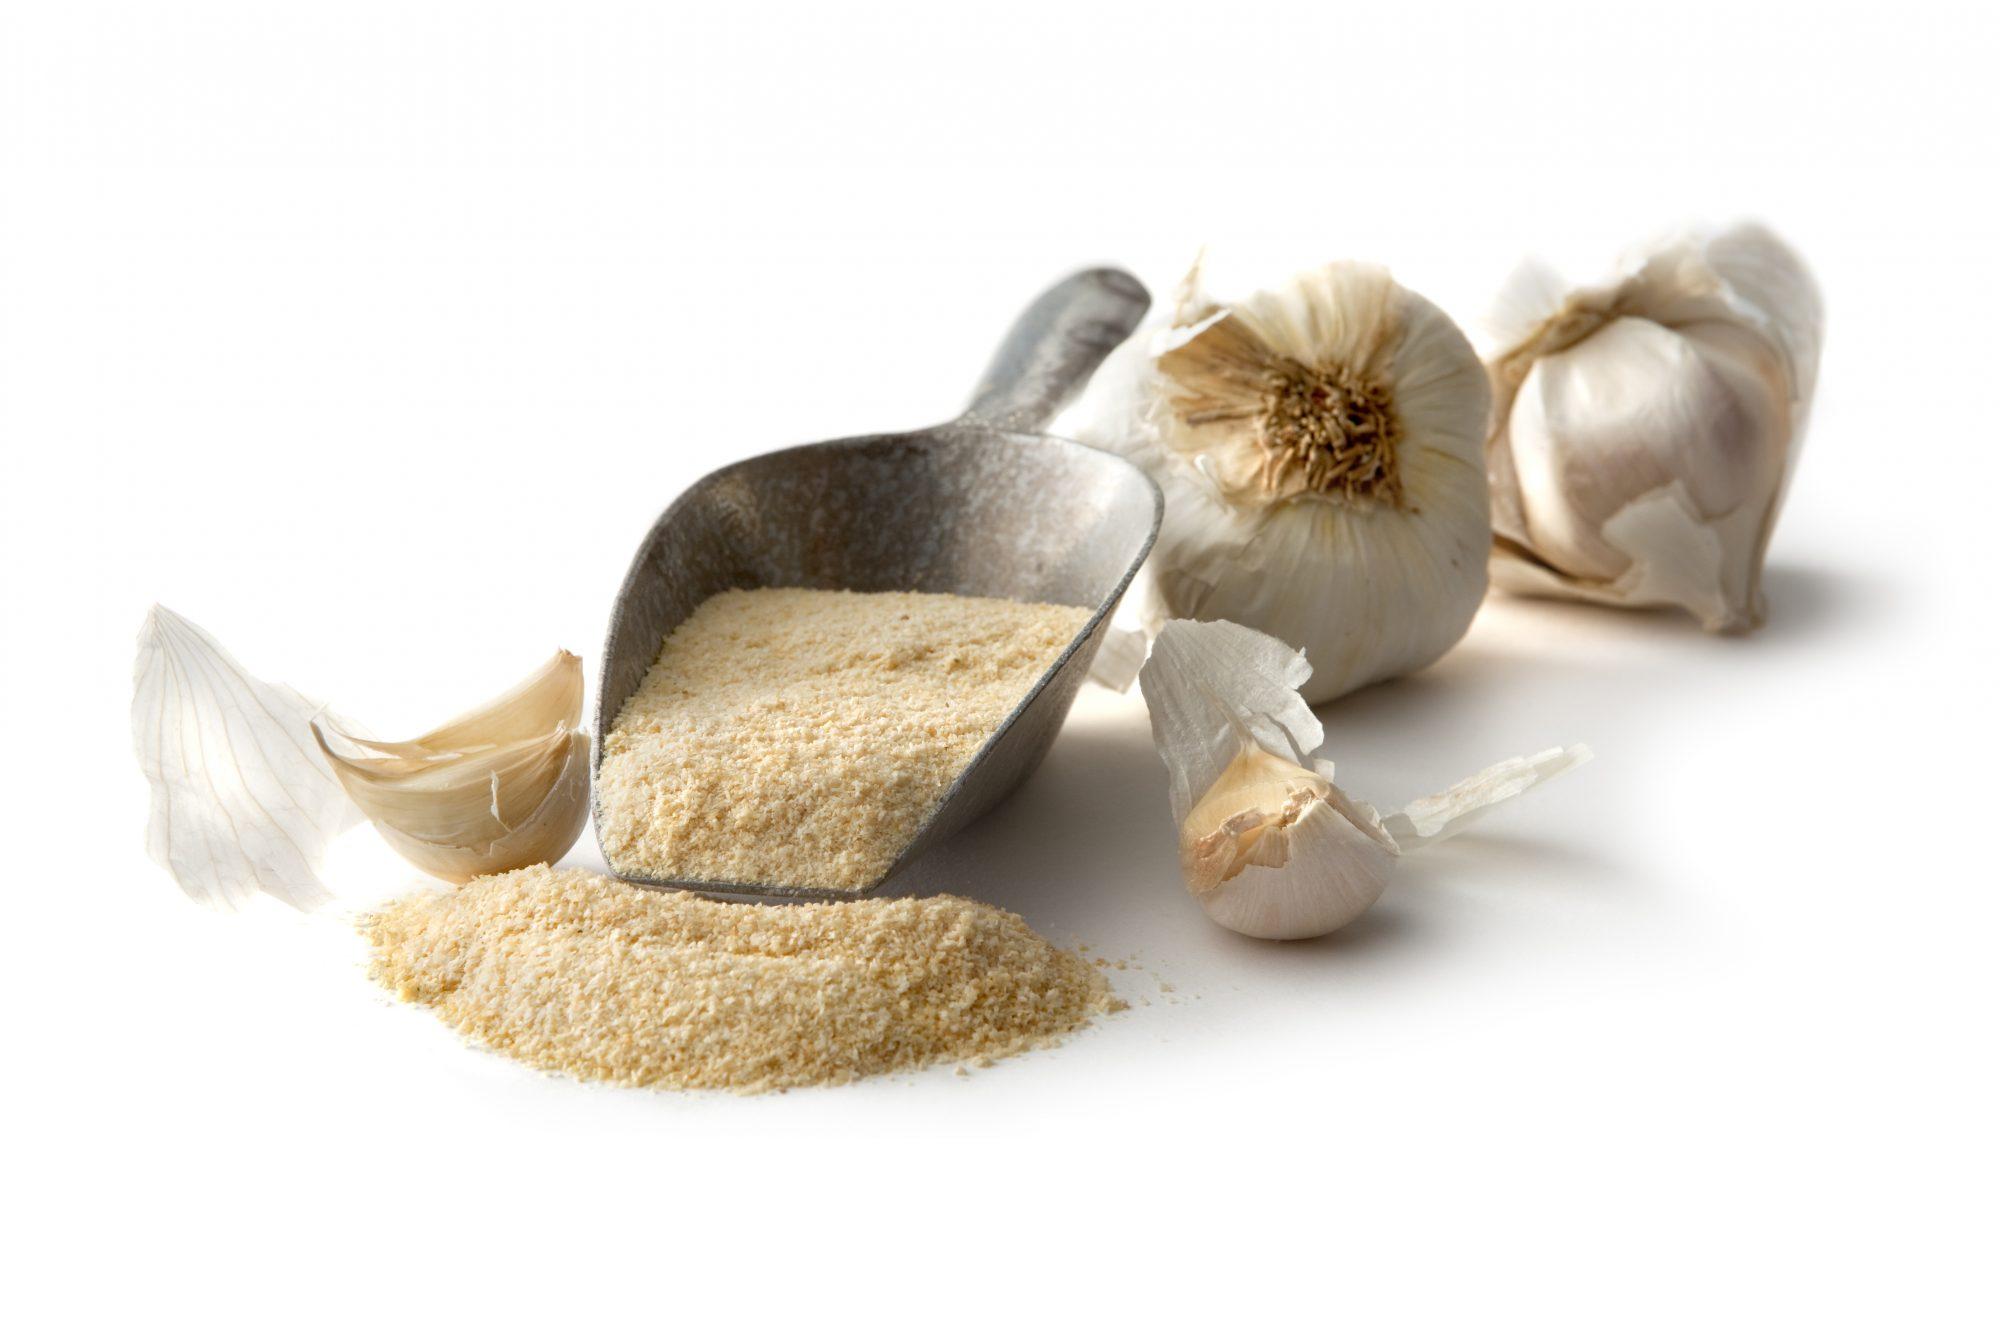 how to use garlic powder